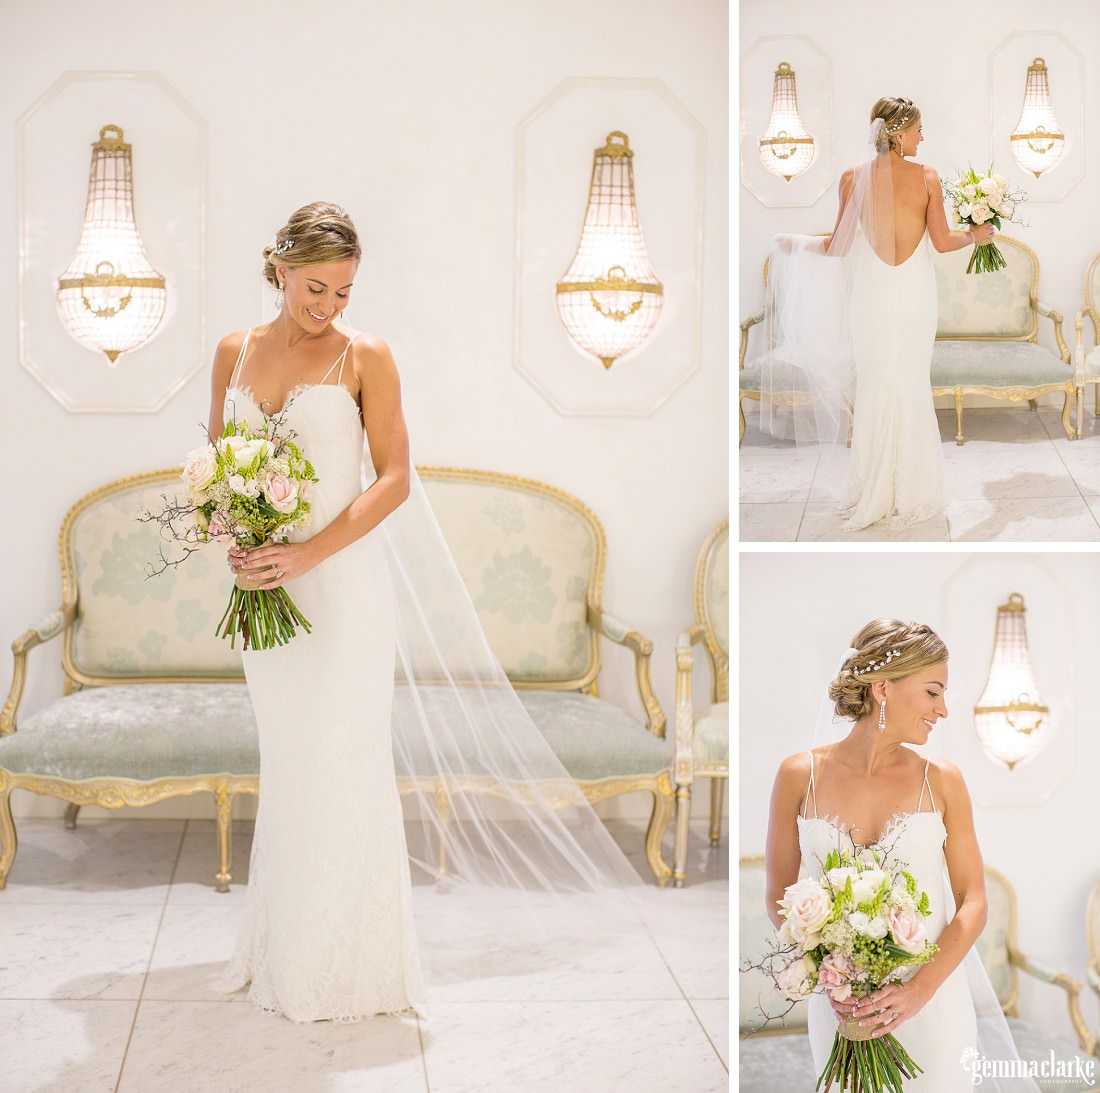 gemmaclarkephotography_jaspers-berry-wedding_south-coast-wedding_nikki-and-dan_0037